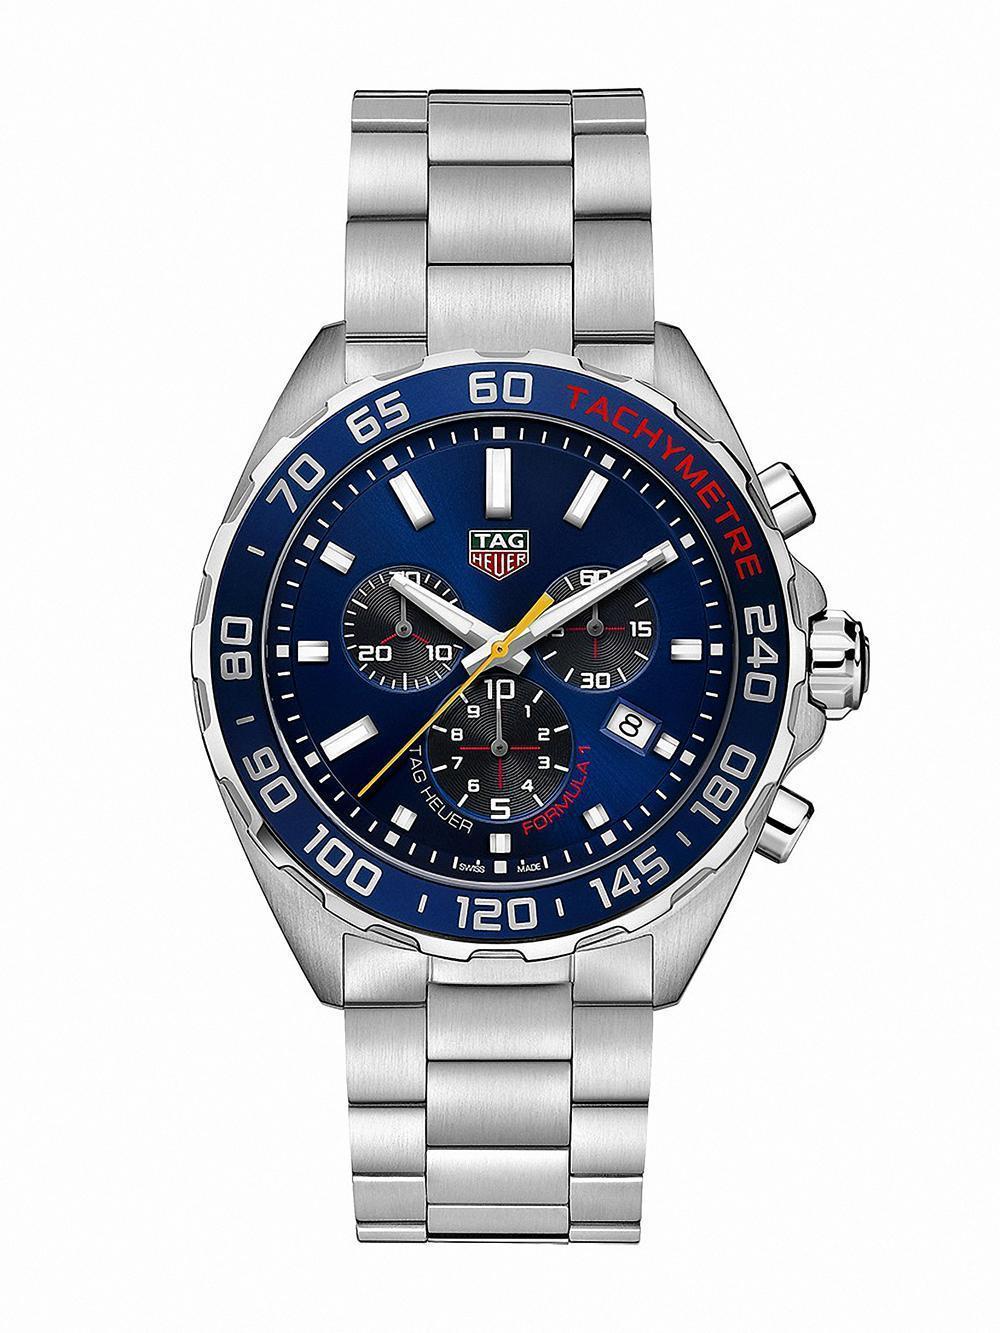 TAG Heuer ASTON MARTIN 紅牛F1車隊2020特別版聯名腕錶 參考編號CAZ101AB.BA0842 建議售價NT$55,500